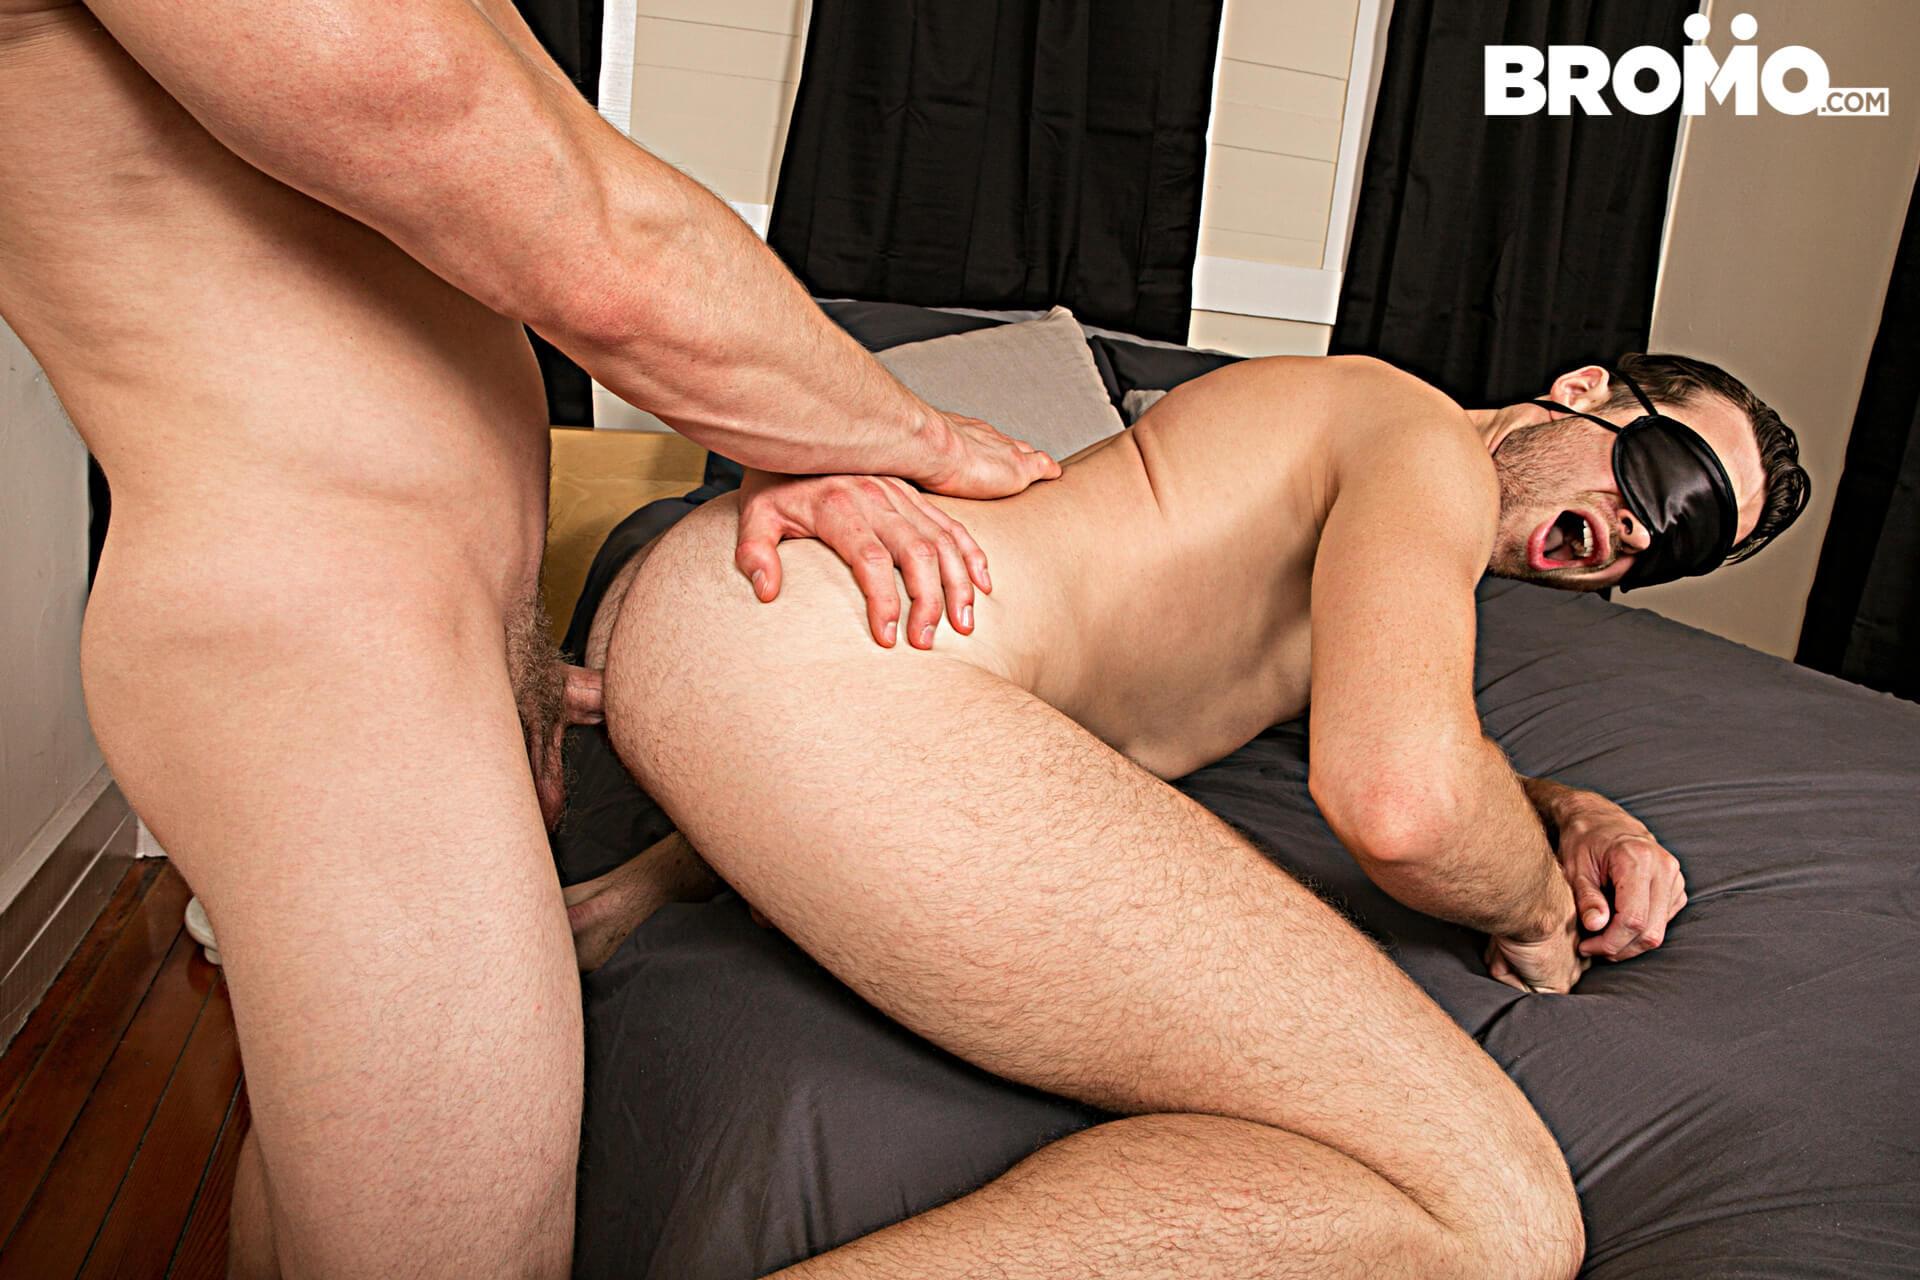 bromo raw obsession part 3 brandon moore chris blades gay porn blog image 16